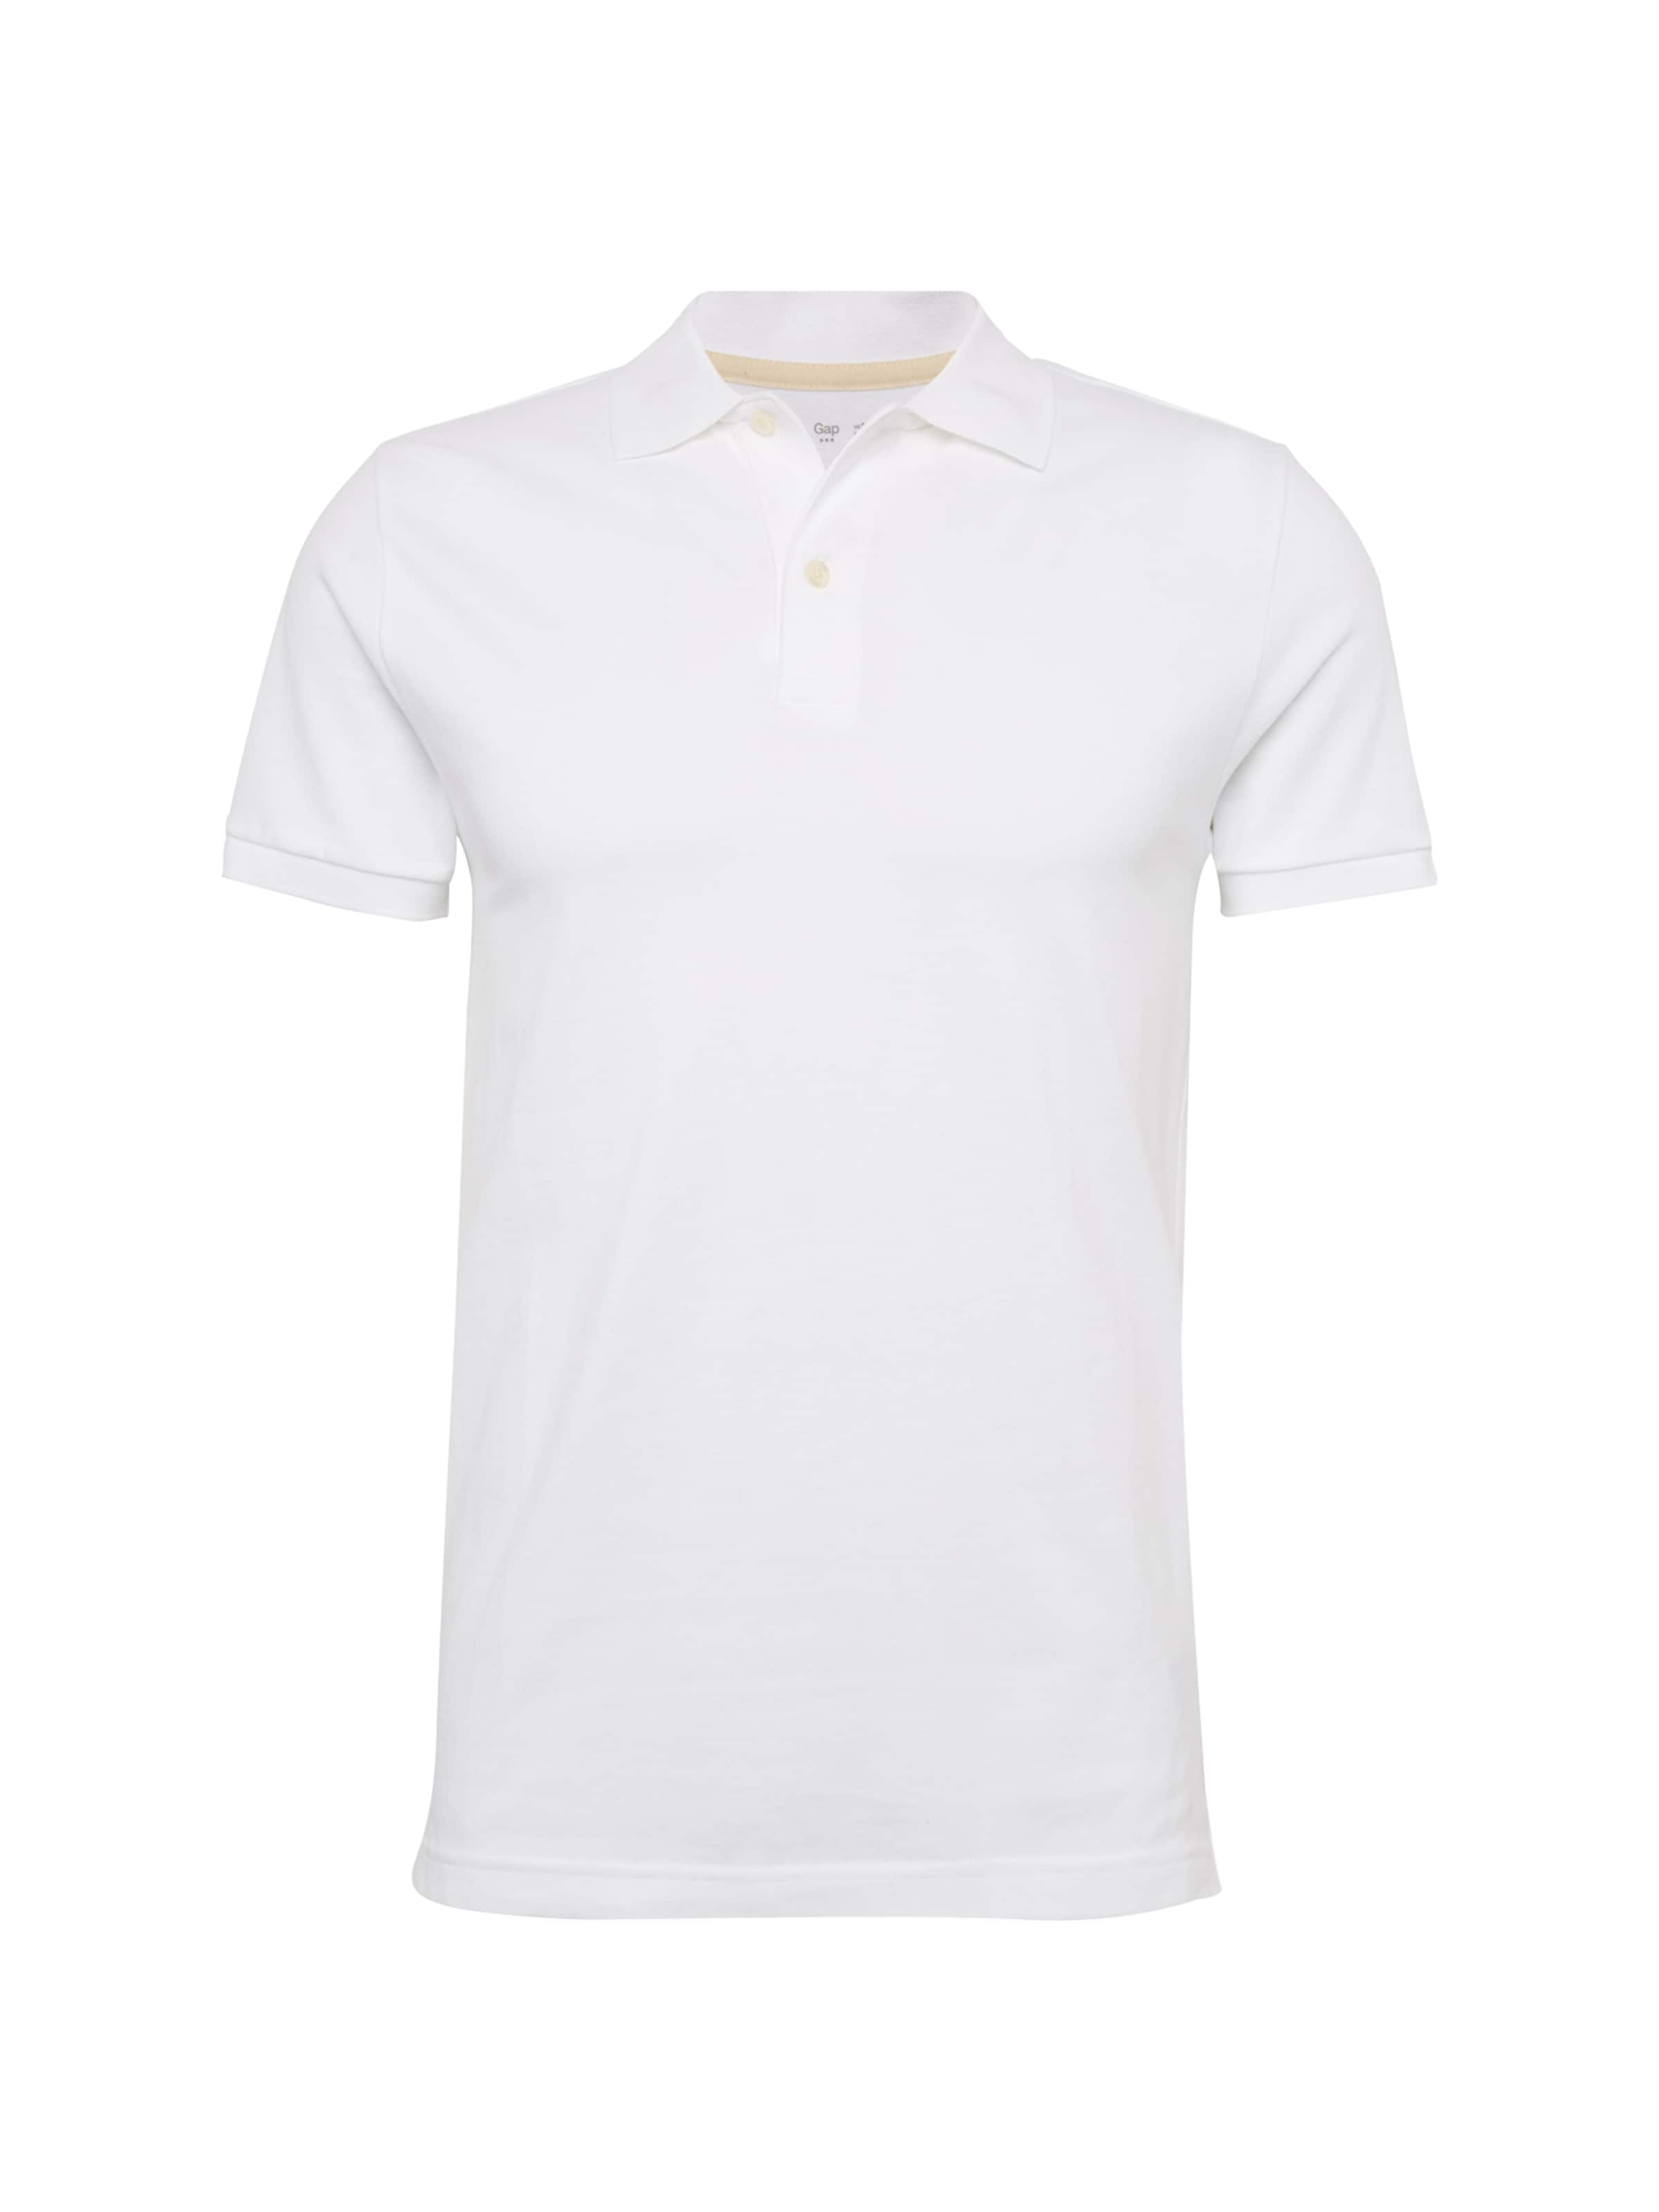 Gap 'v Blanc T En shirt basic Pique' Errx0gWFwq